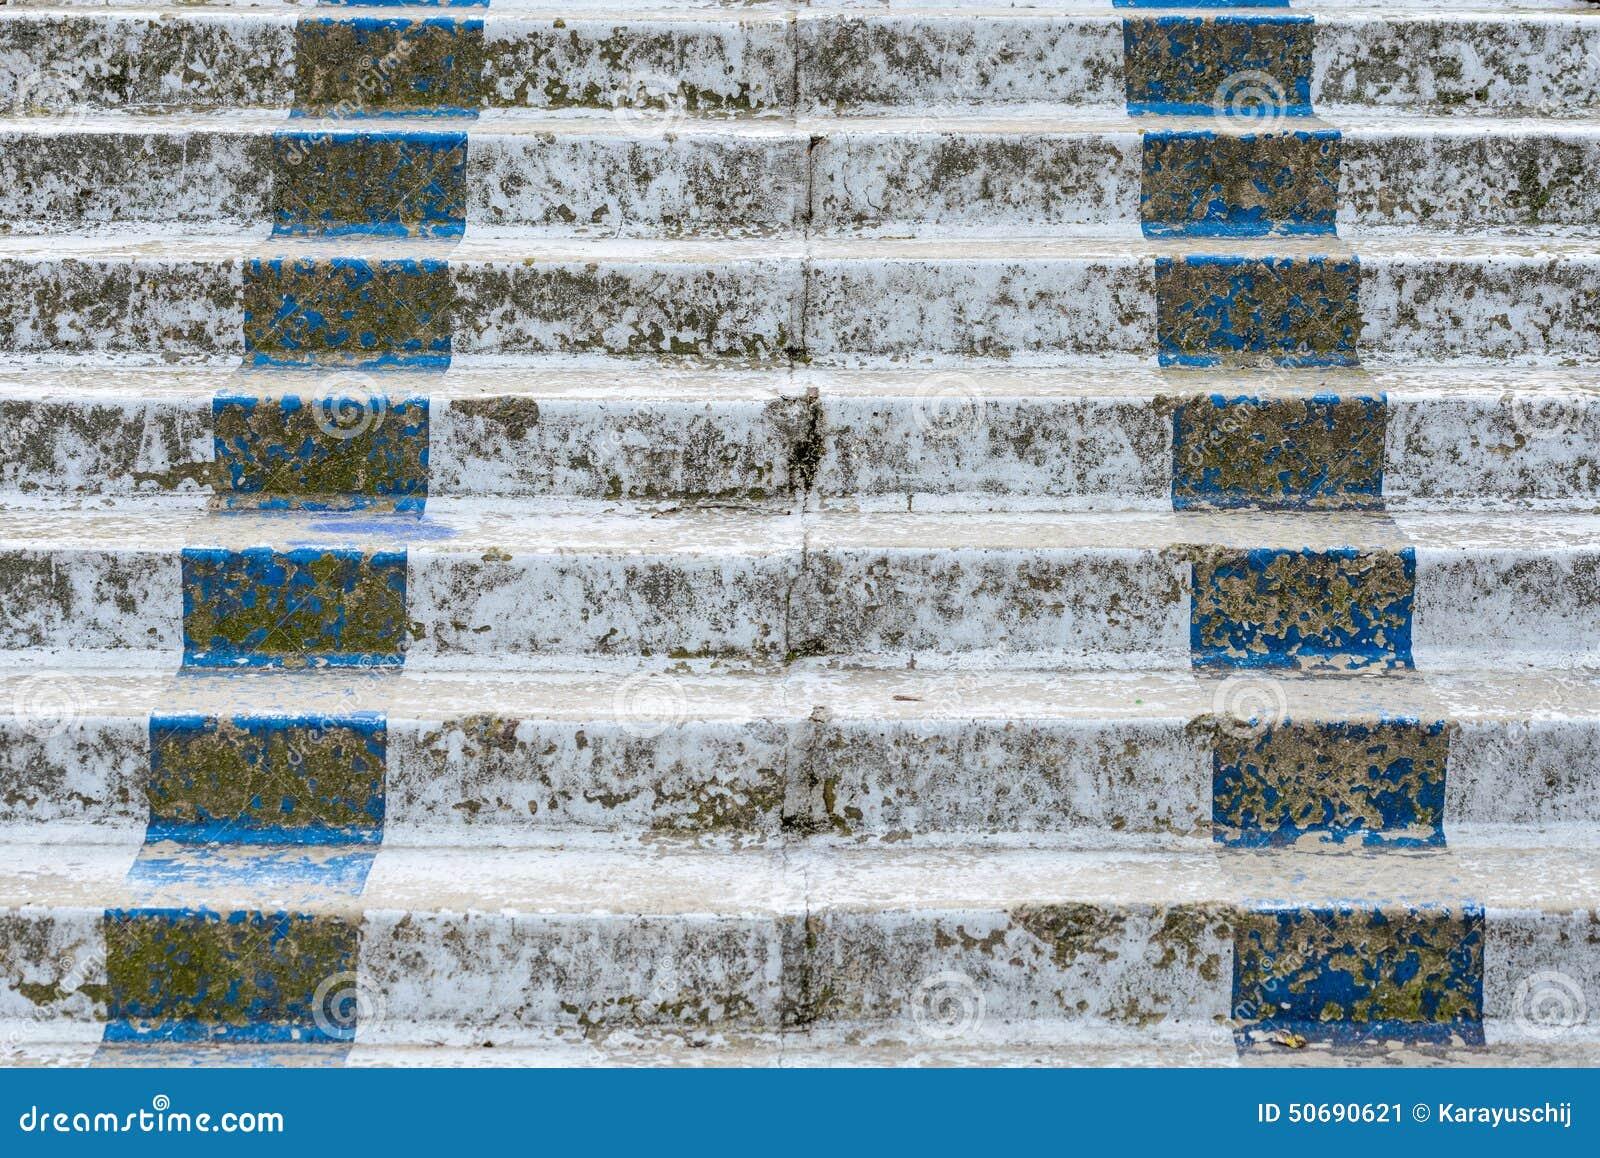 Download 对没什么的楼梯 库存图片. 图片 包括有 空白, 经纪, 抽象, 方式, 室外, 拱道, 杂乱, 建筑, 蓝色 - 50690621